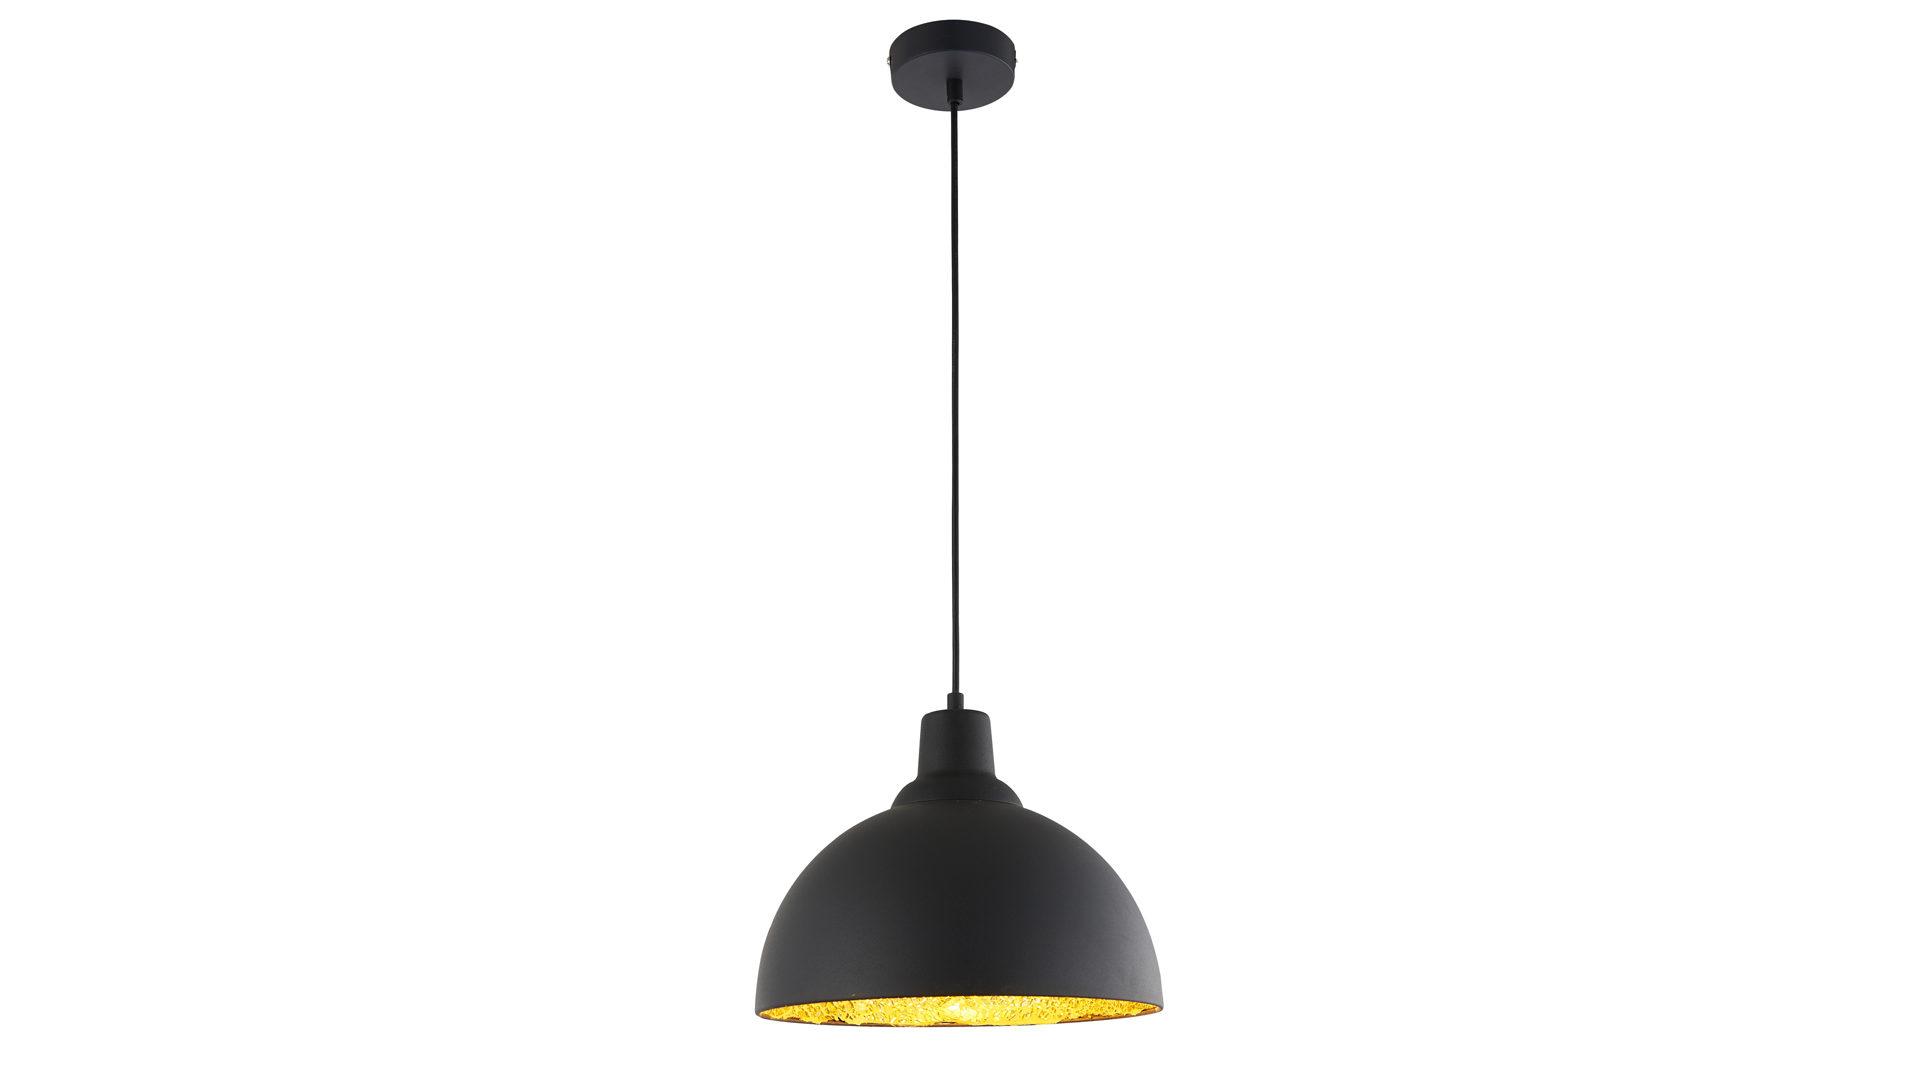 Mobel Bohn Crailsheim Raume Esszimmer Lampen Leuchten